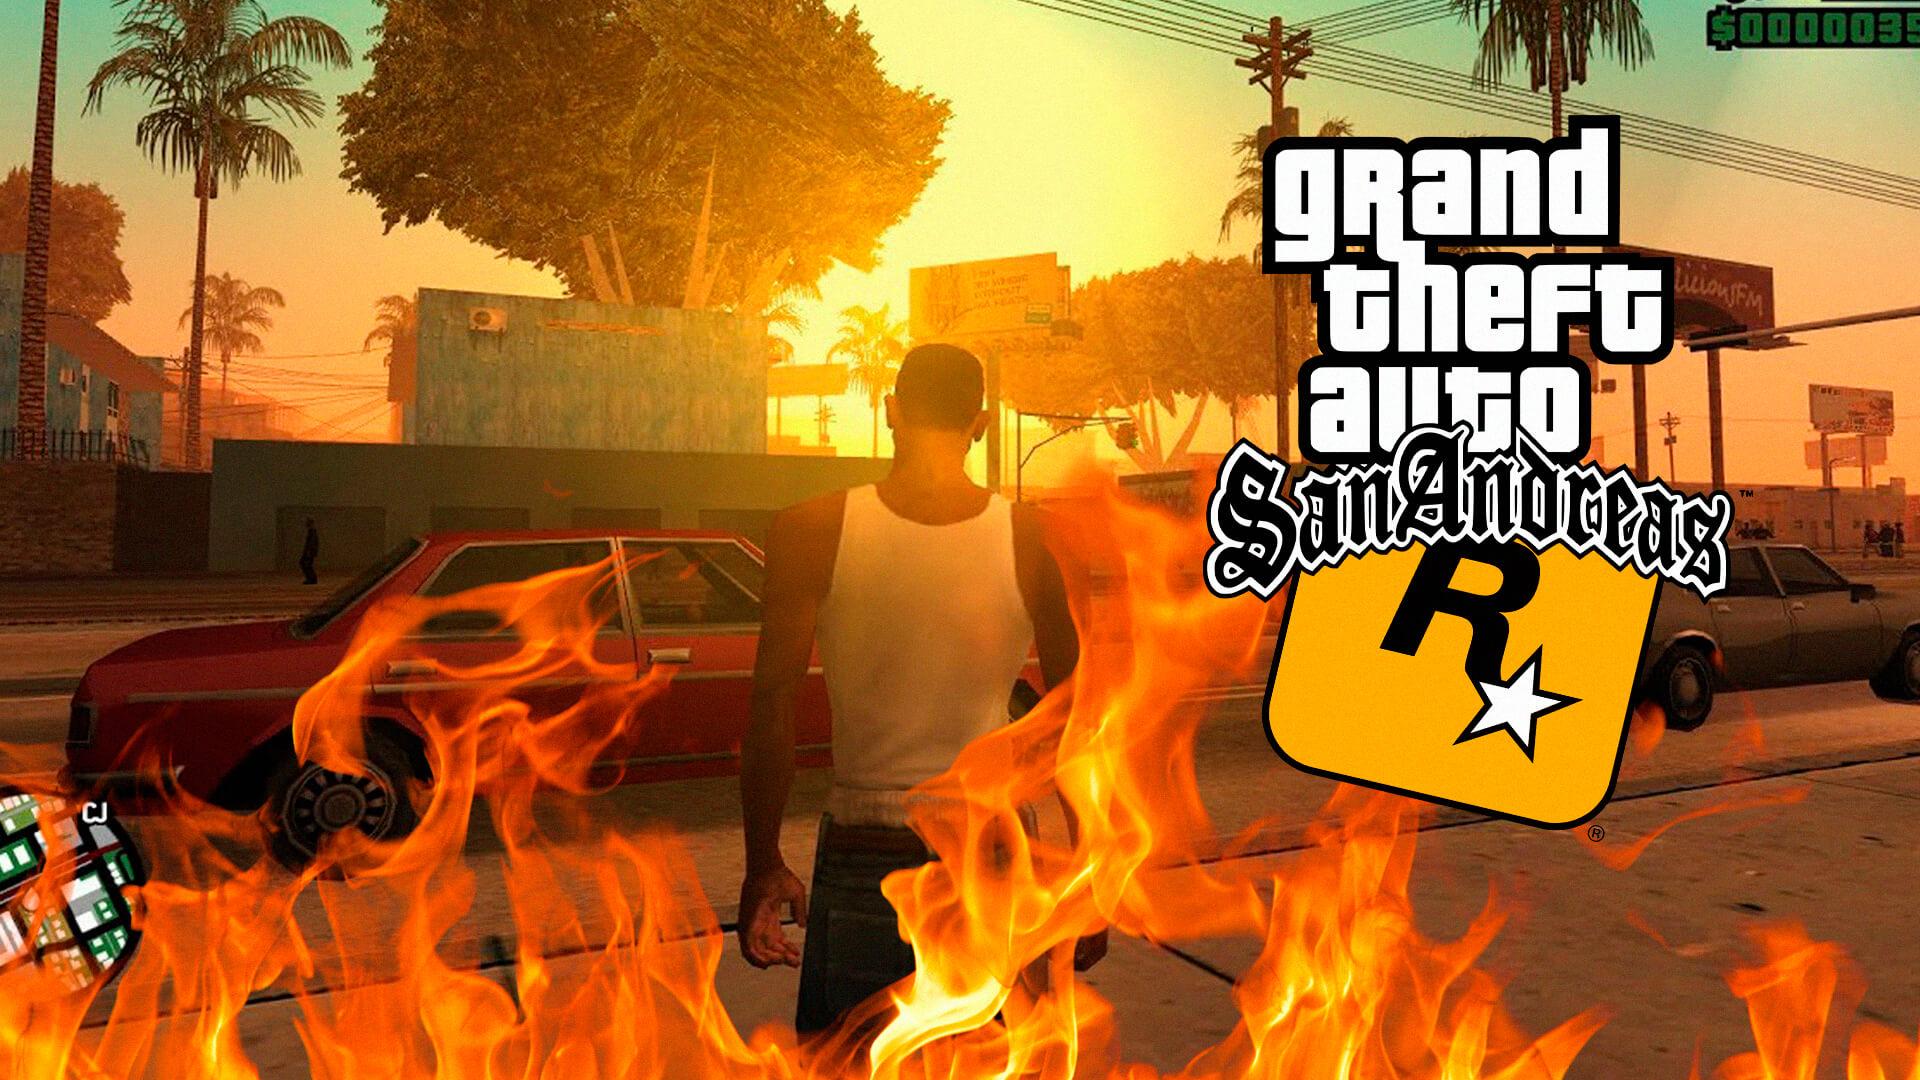 GTA San Andreas | Take Two vence; Grande mod é apagado! 1